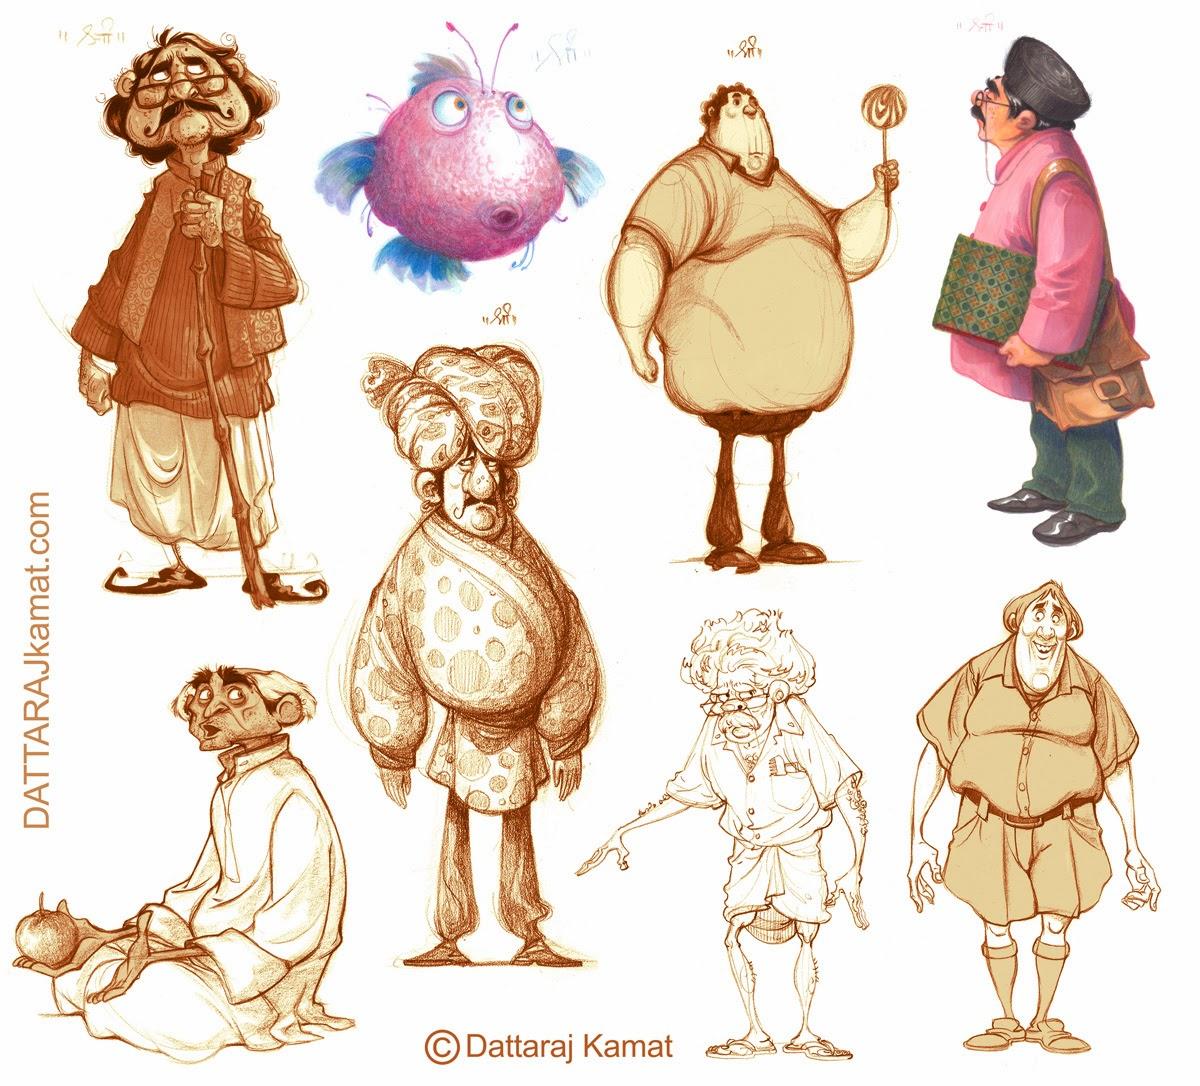 Animation Character Design Theory : Dattaraj kamat animation art february